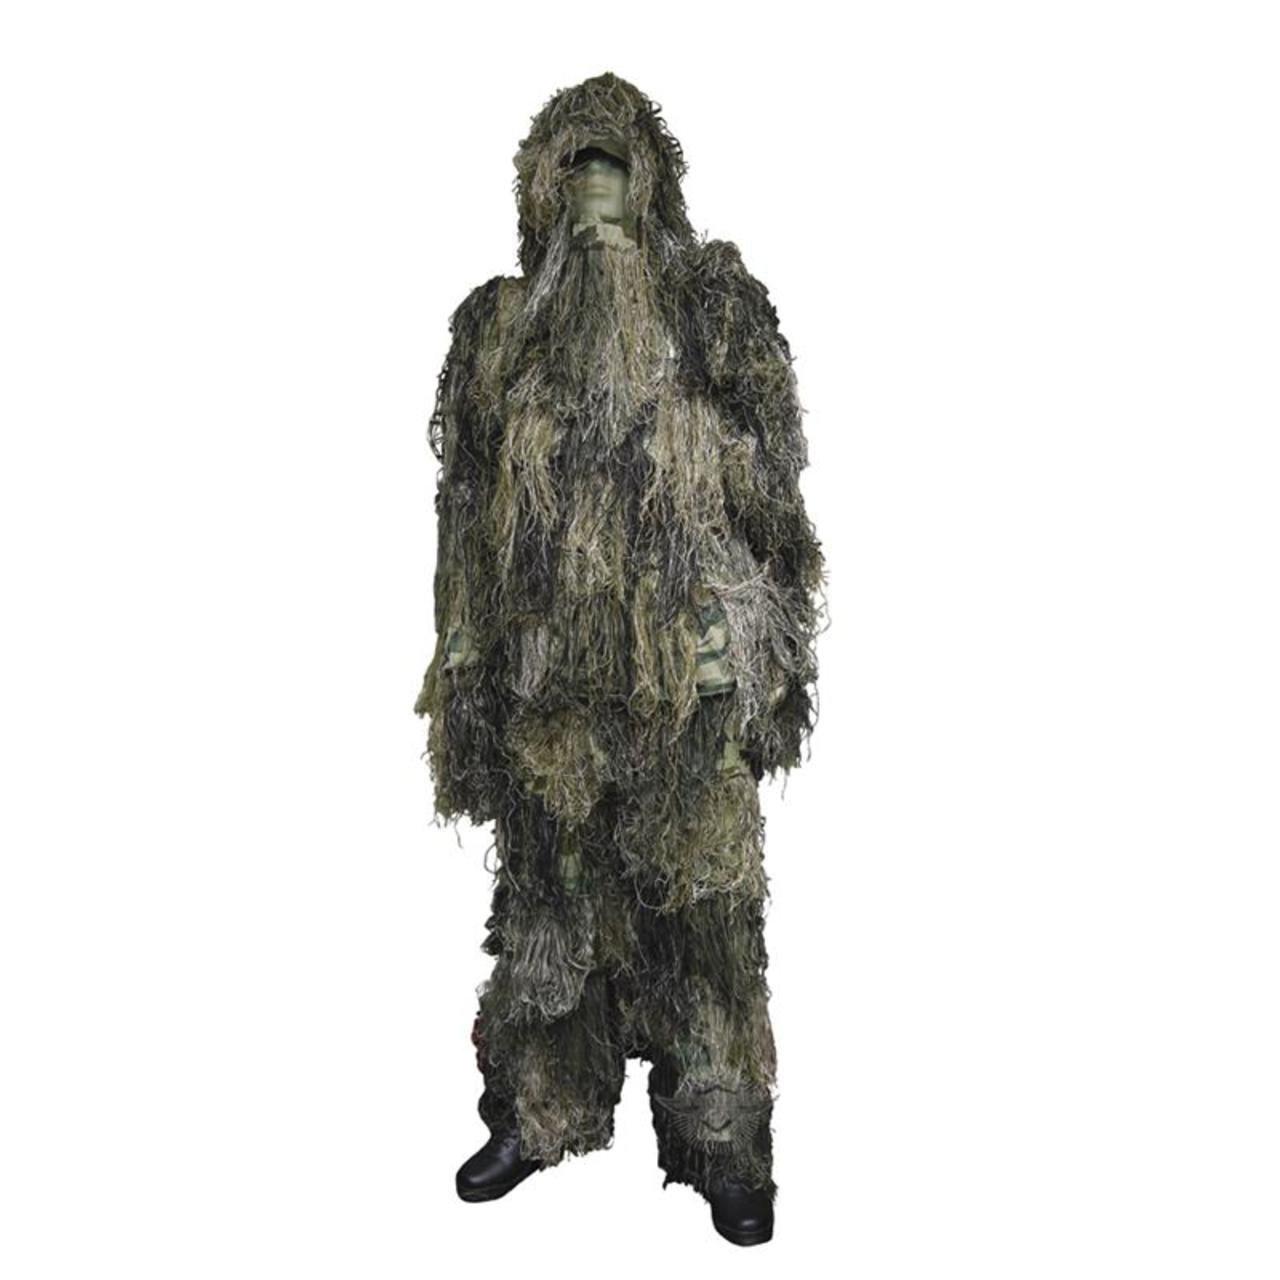 Amazon.com: 5ive Star, traje camuflado, equipo de camuflaje ...